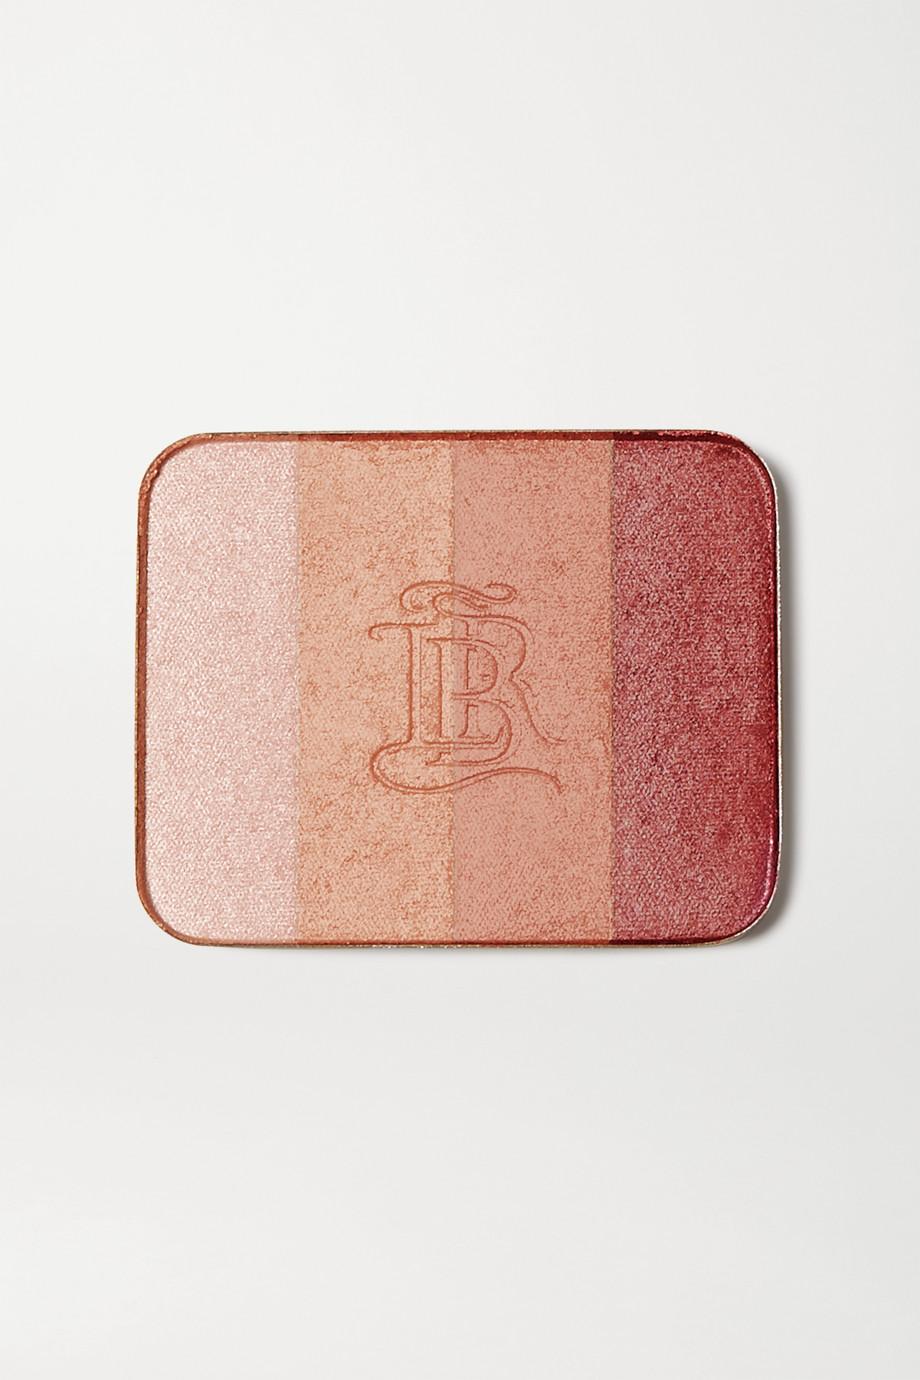 La Bouche Rouge Les Ombres Eyeshadow Palette Refill – Salton – Nachfüll-Lidschattenpalette